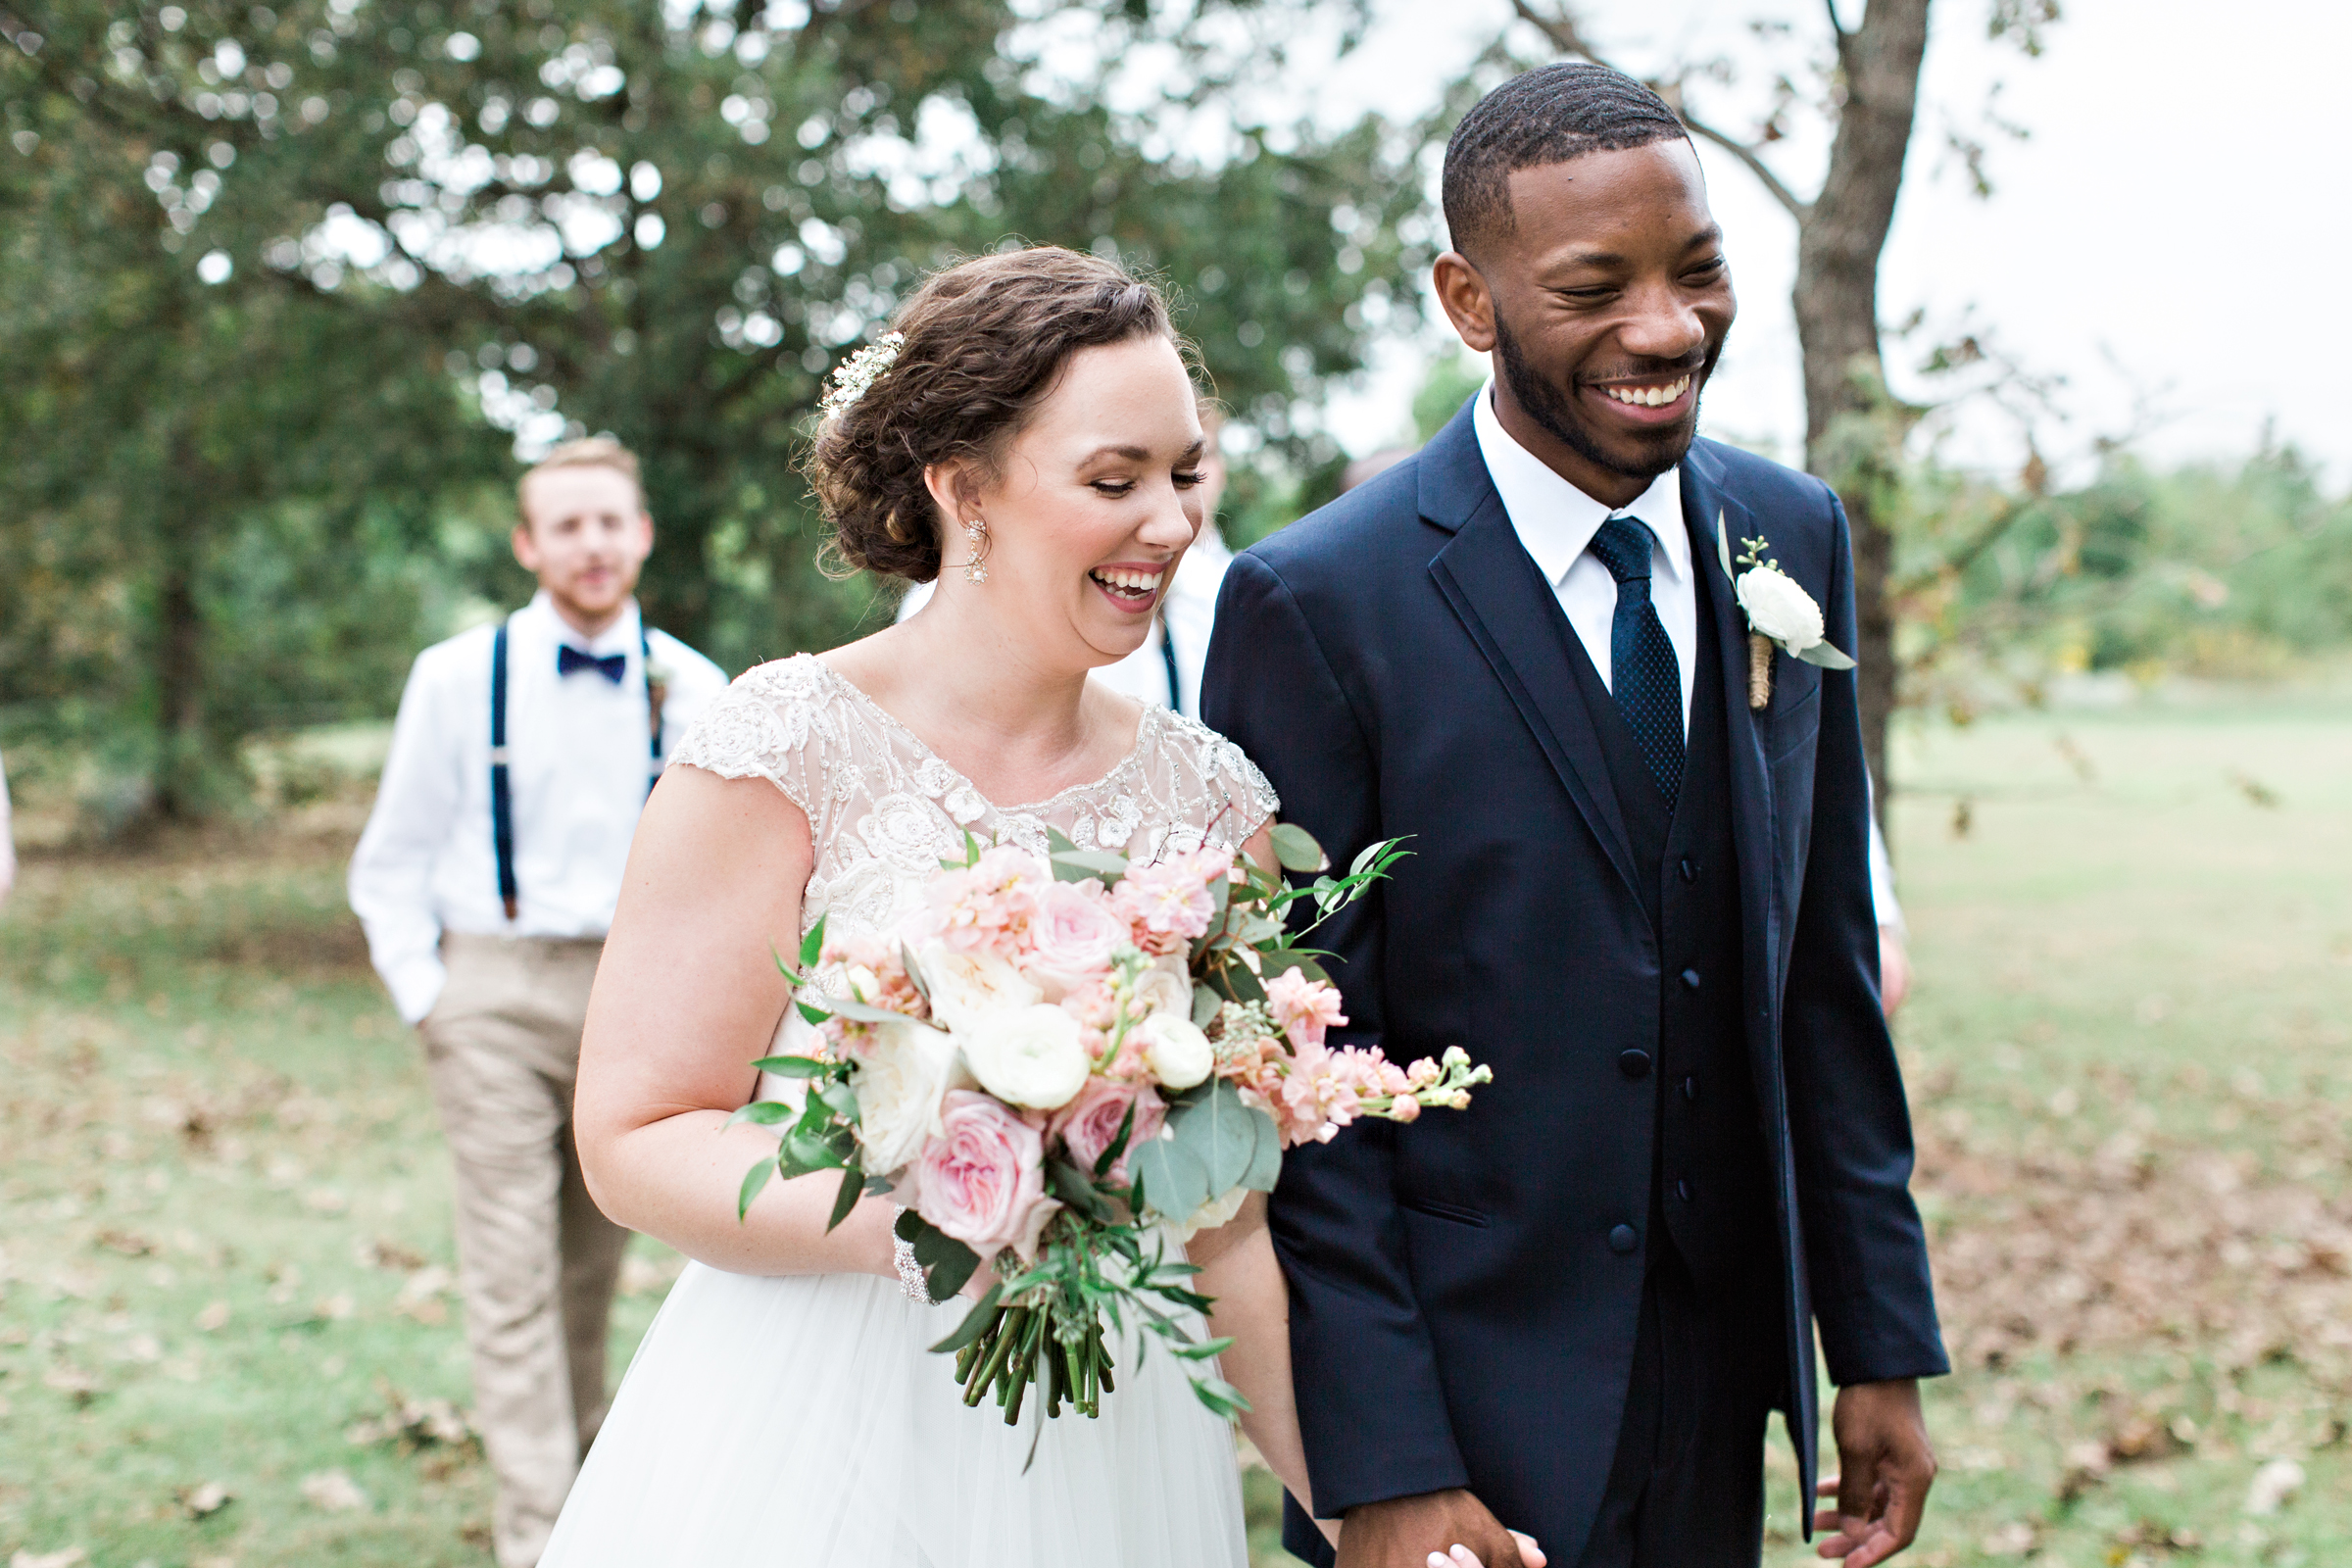 Alabama-Wedding-Photography-Nick-Drollette-Cory-Laura-141.jpg